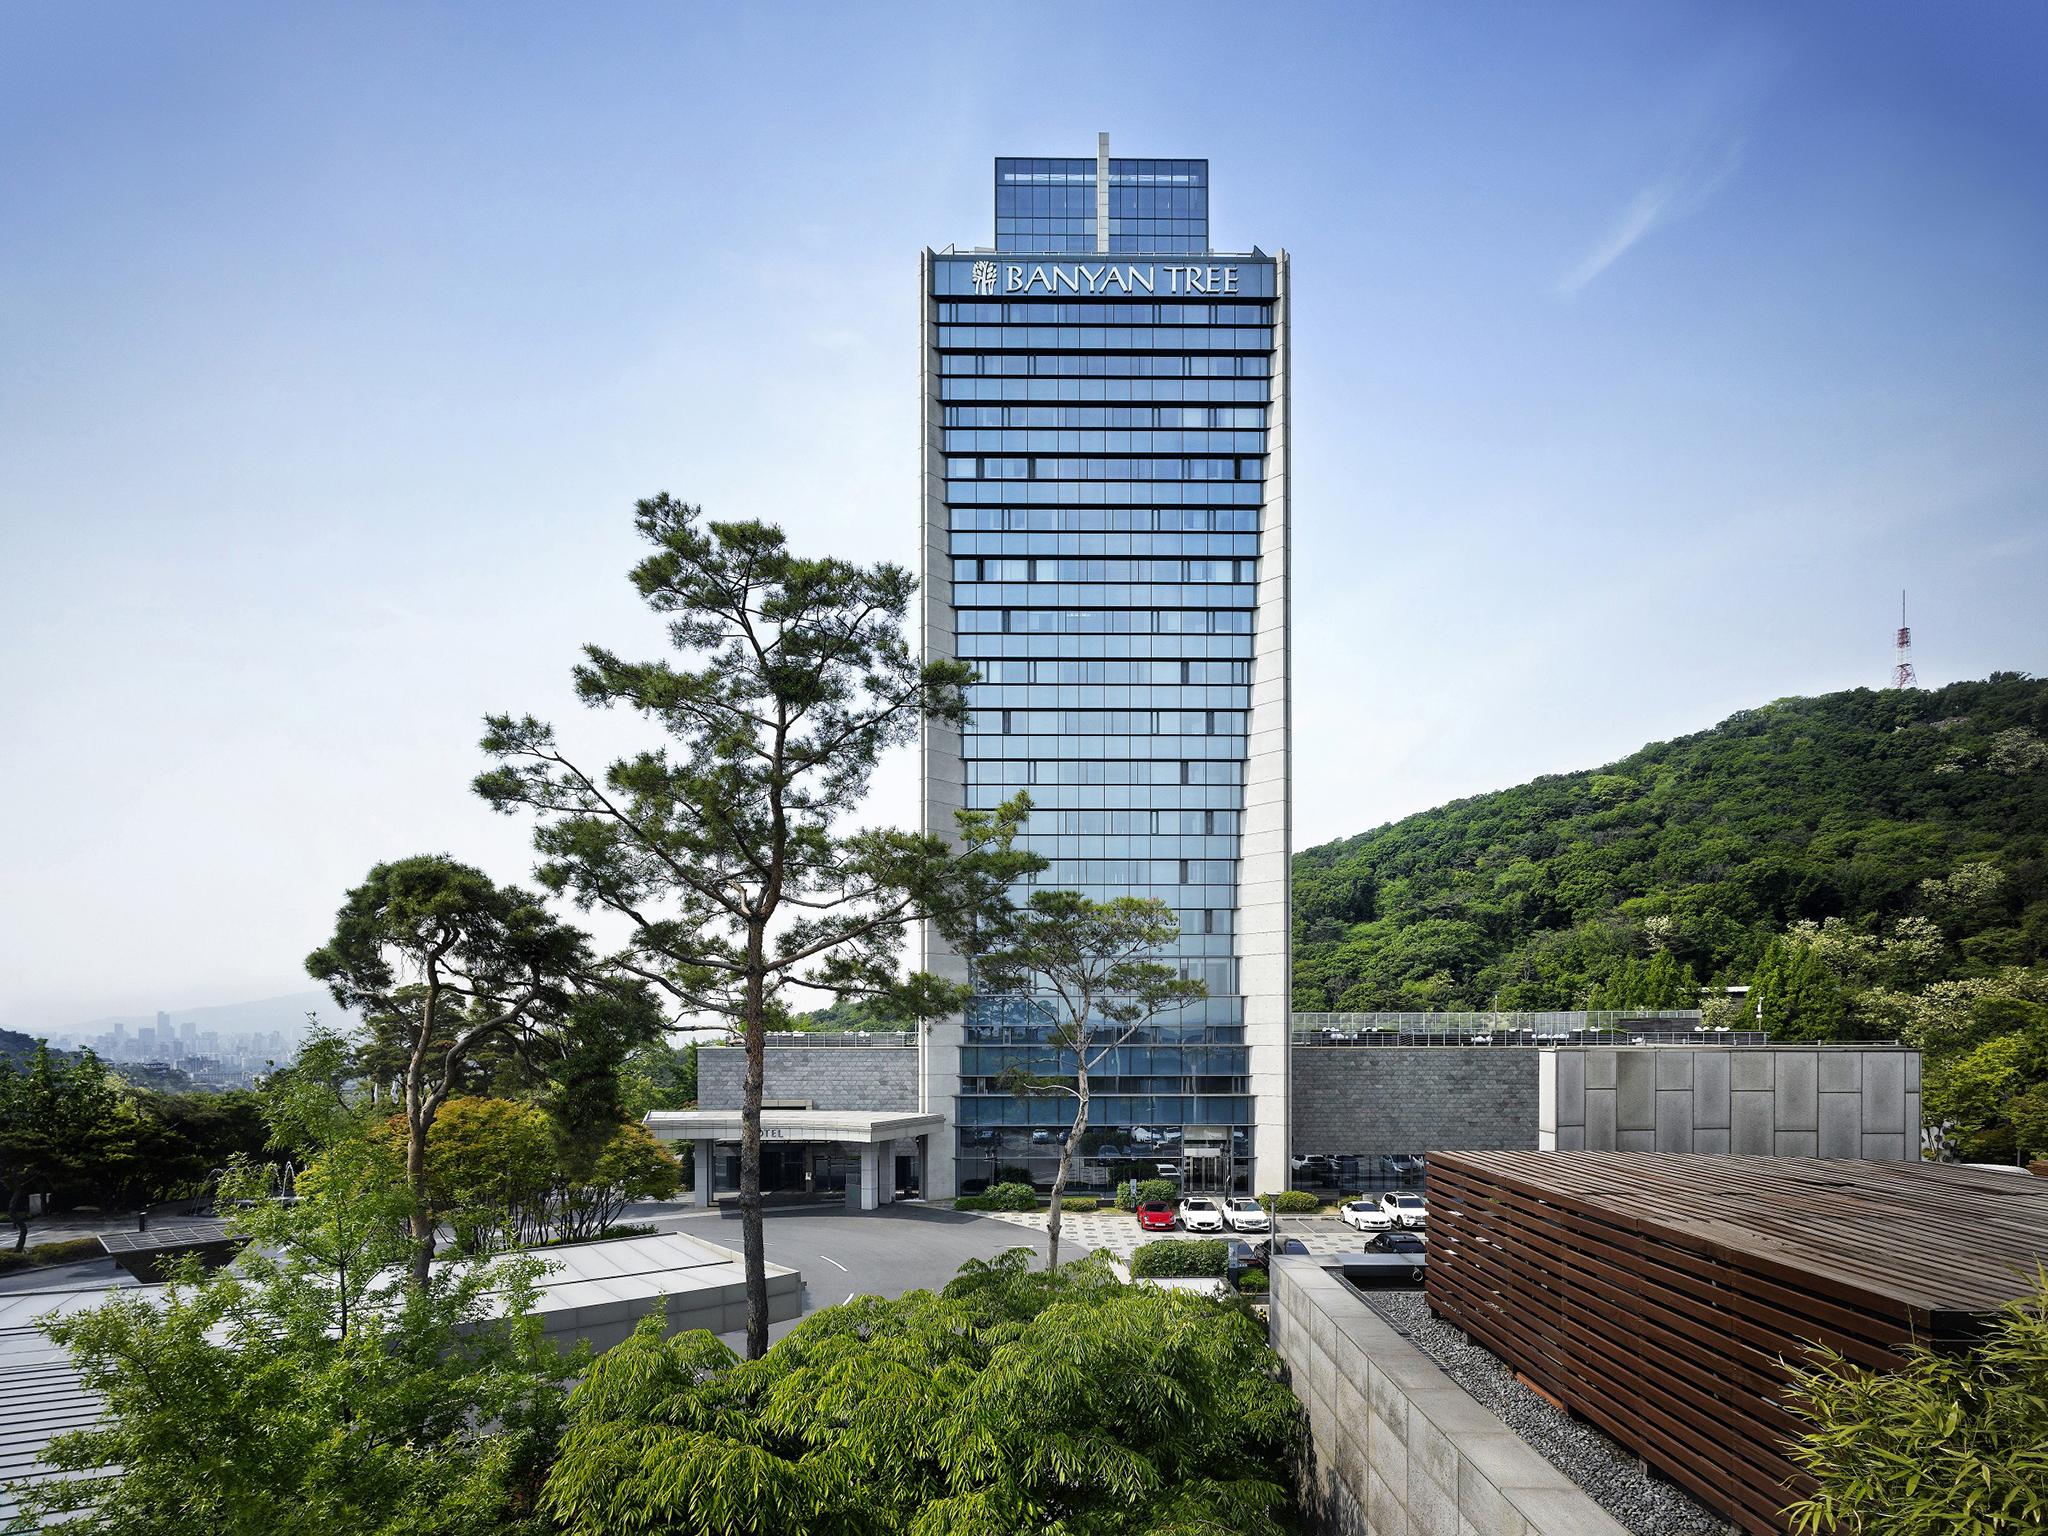 Hôtel - Banyan Tree Club & Spa Seoul